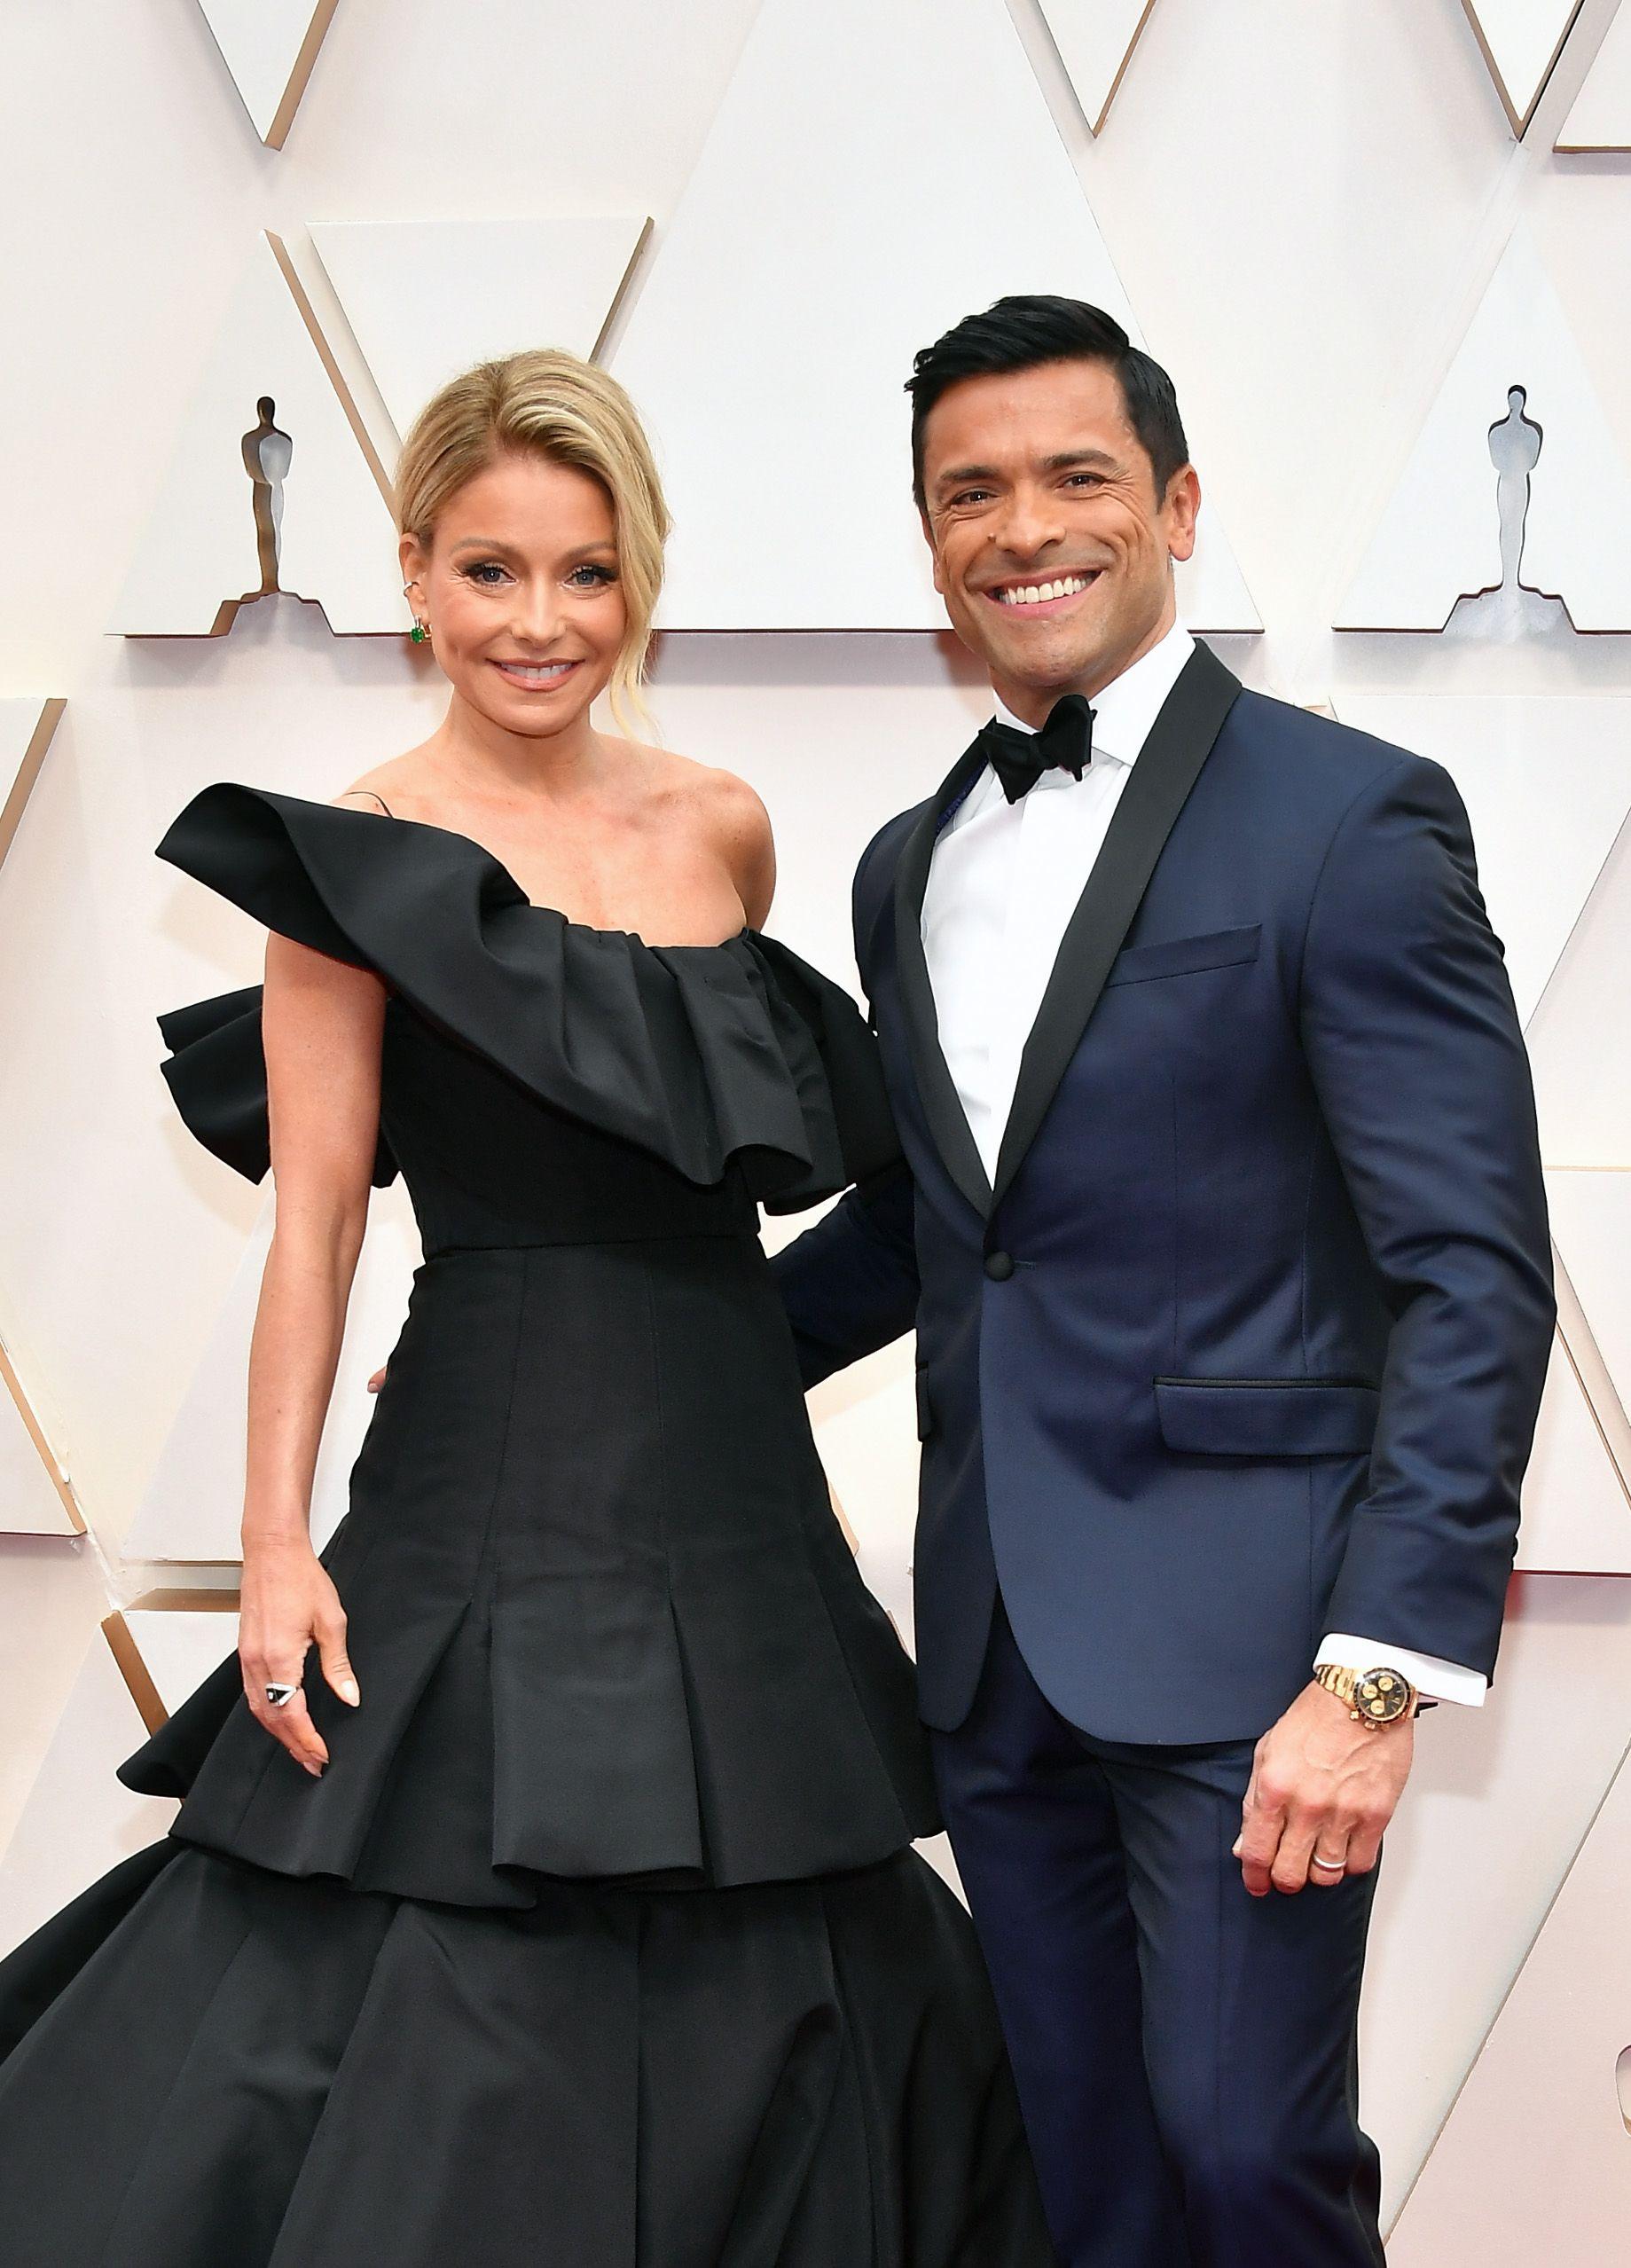 Kelly Ripa and husband on red carpet